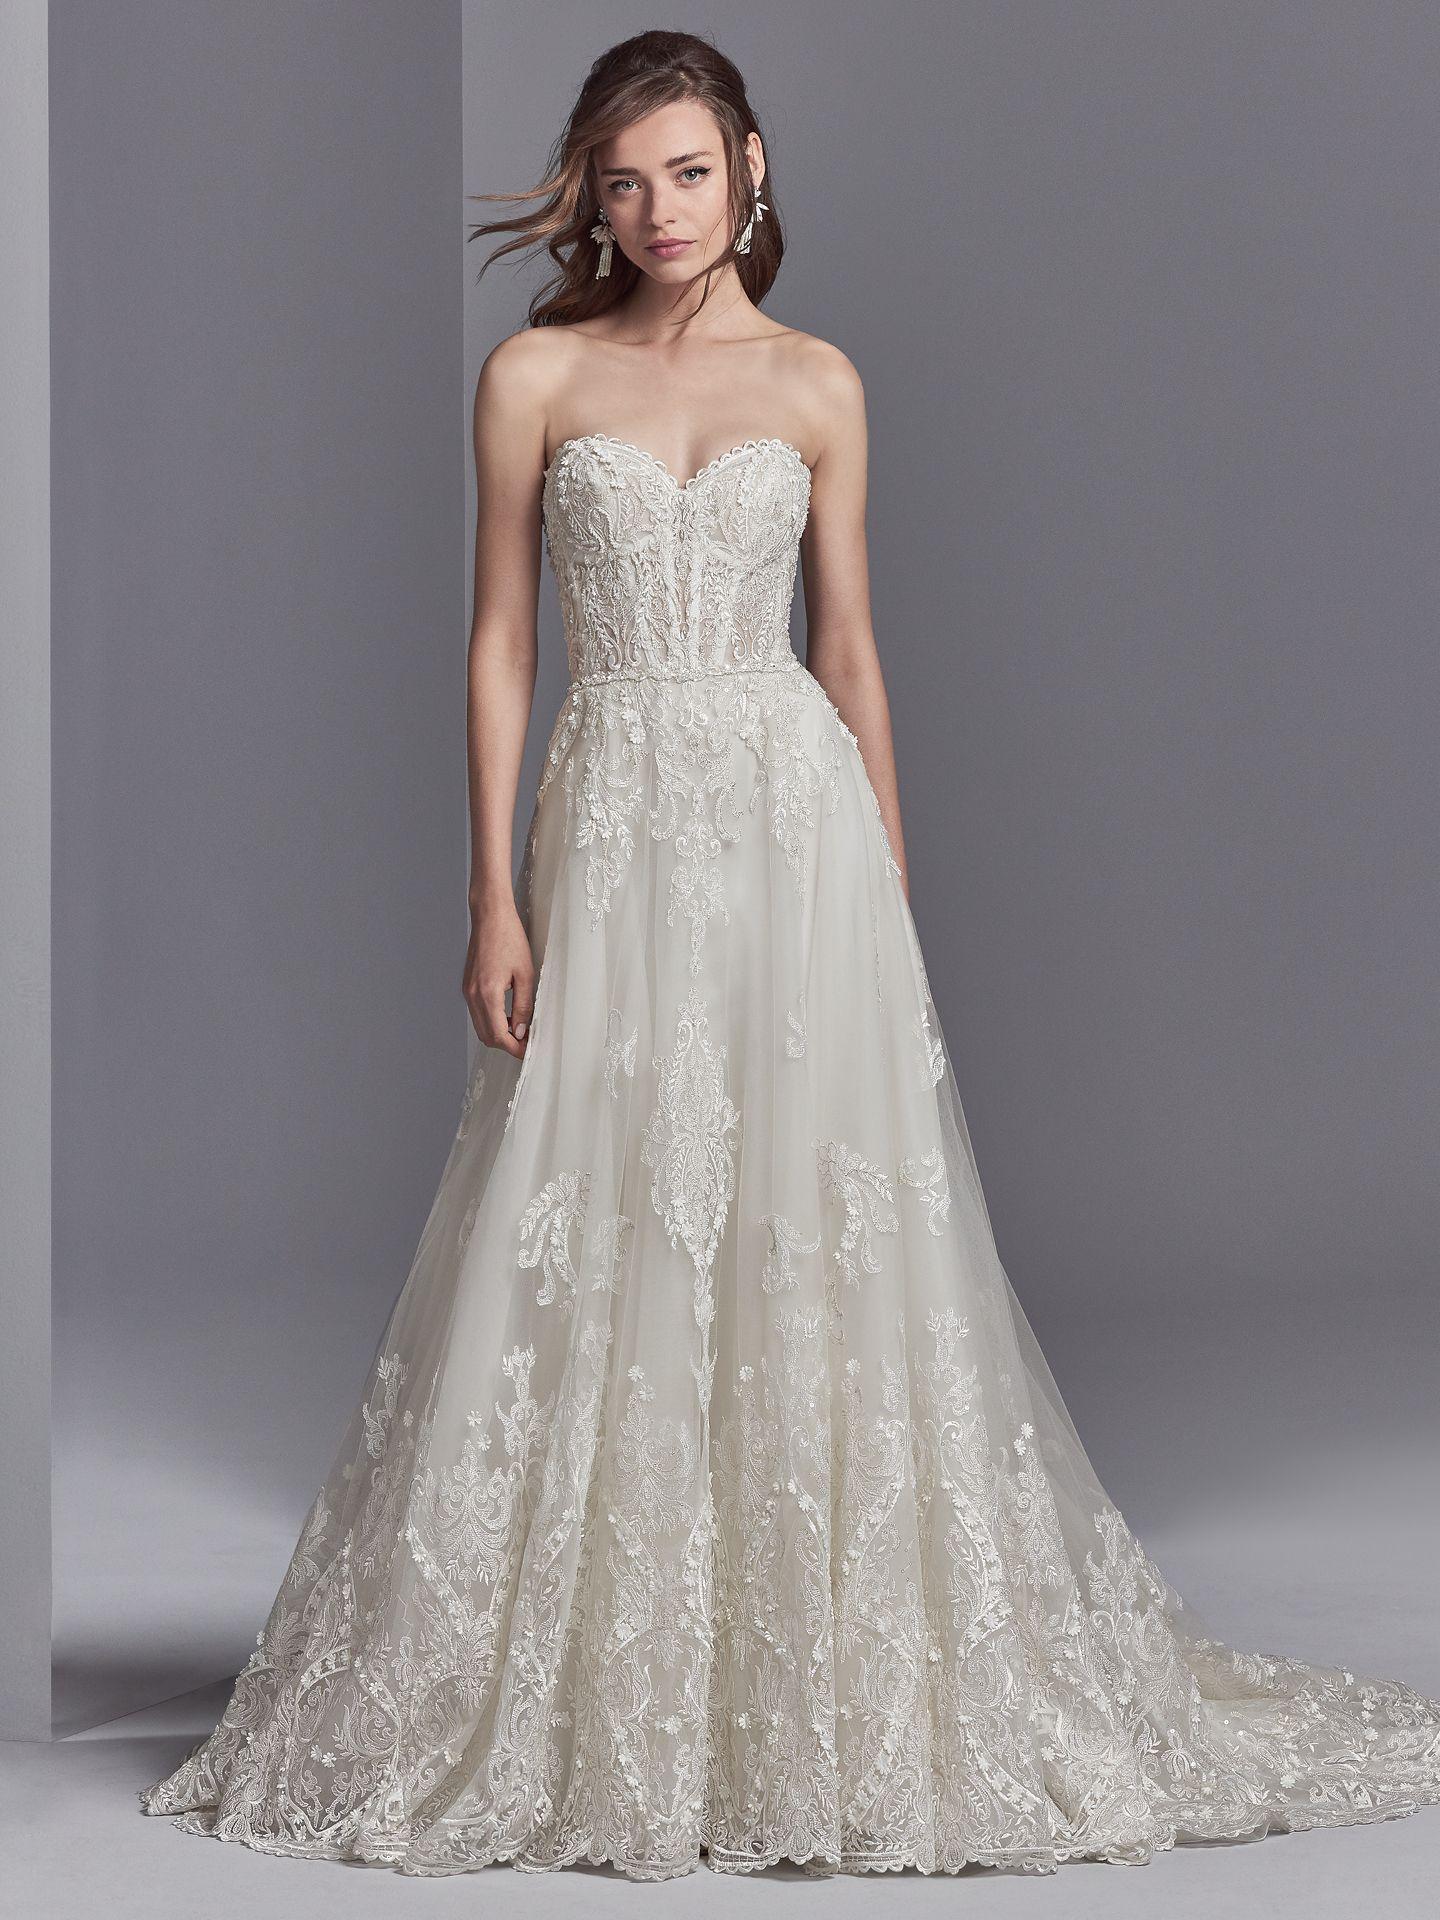 Sottero-and-Midgley-Wedding-Dress-Watson-8SN544-Alt1.jpg